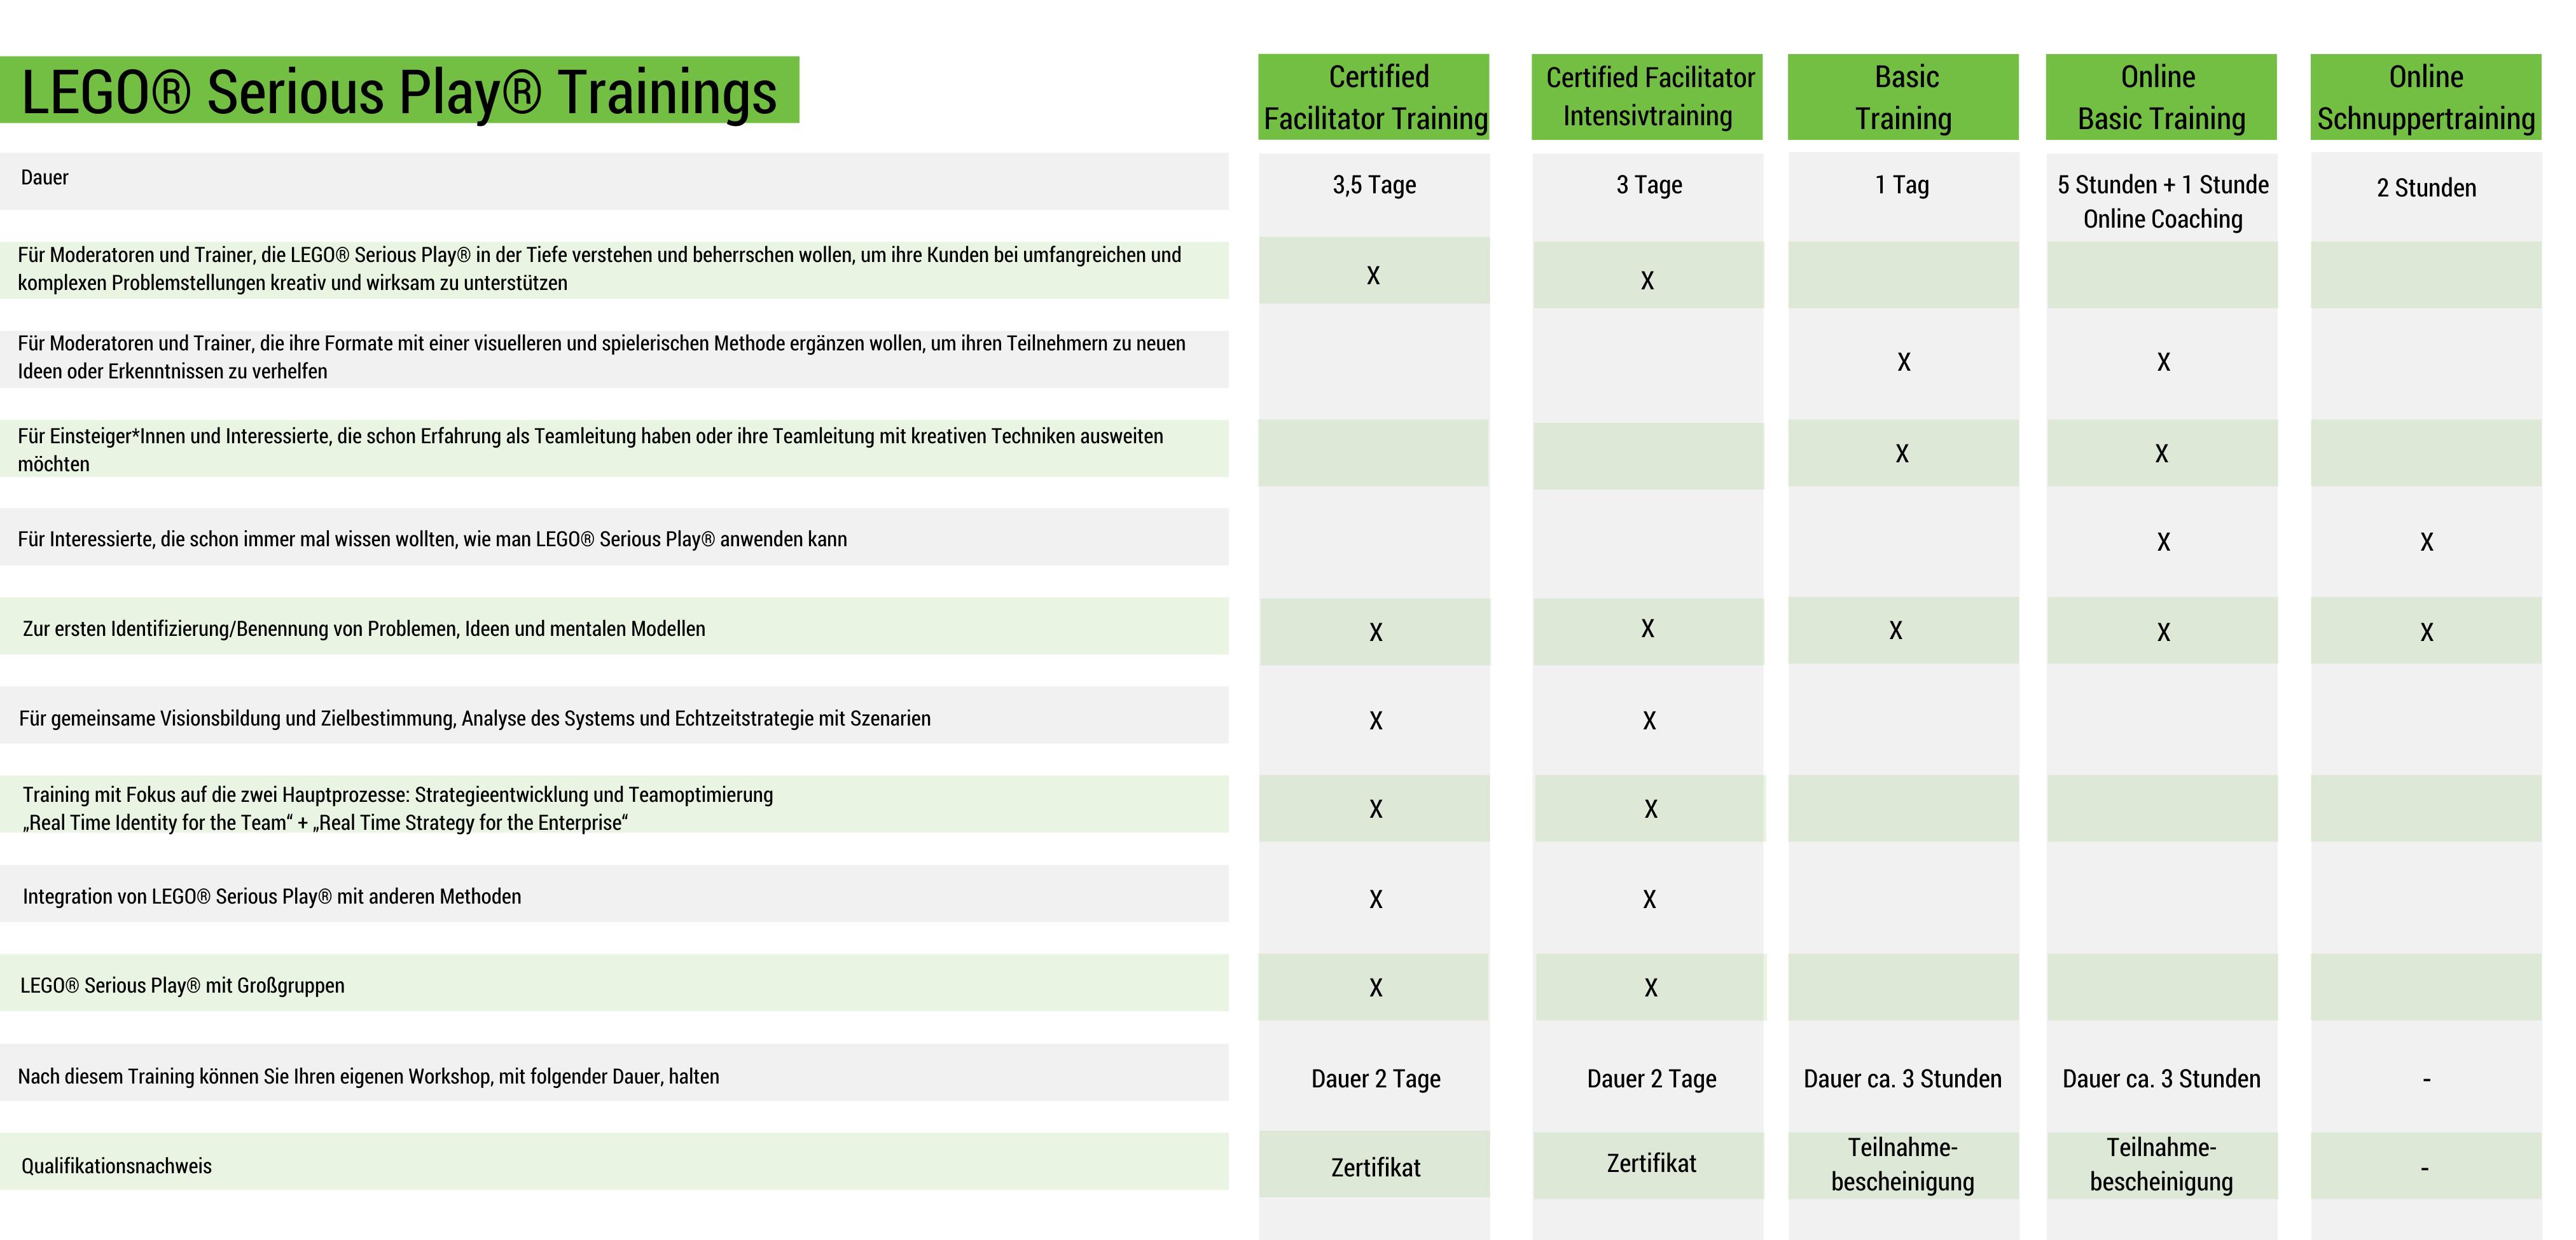 Vergleichstabelle LSP Trainings